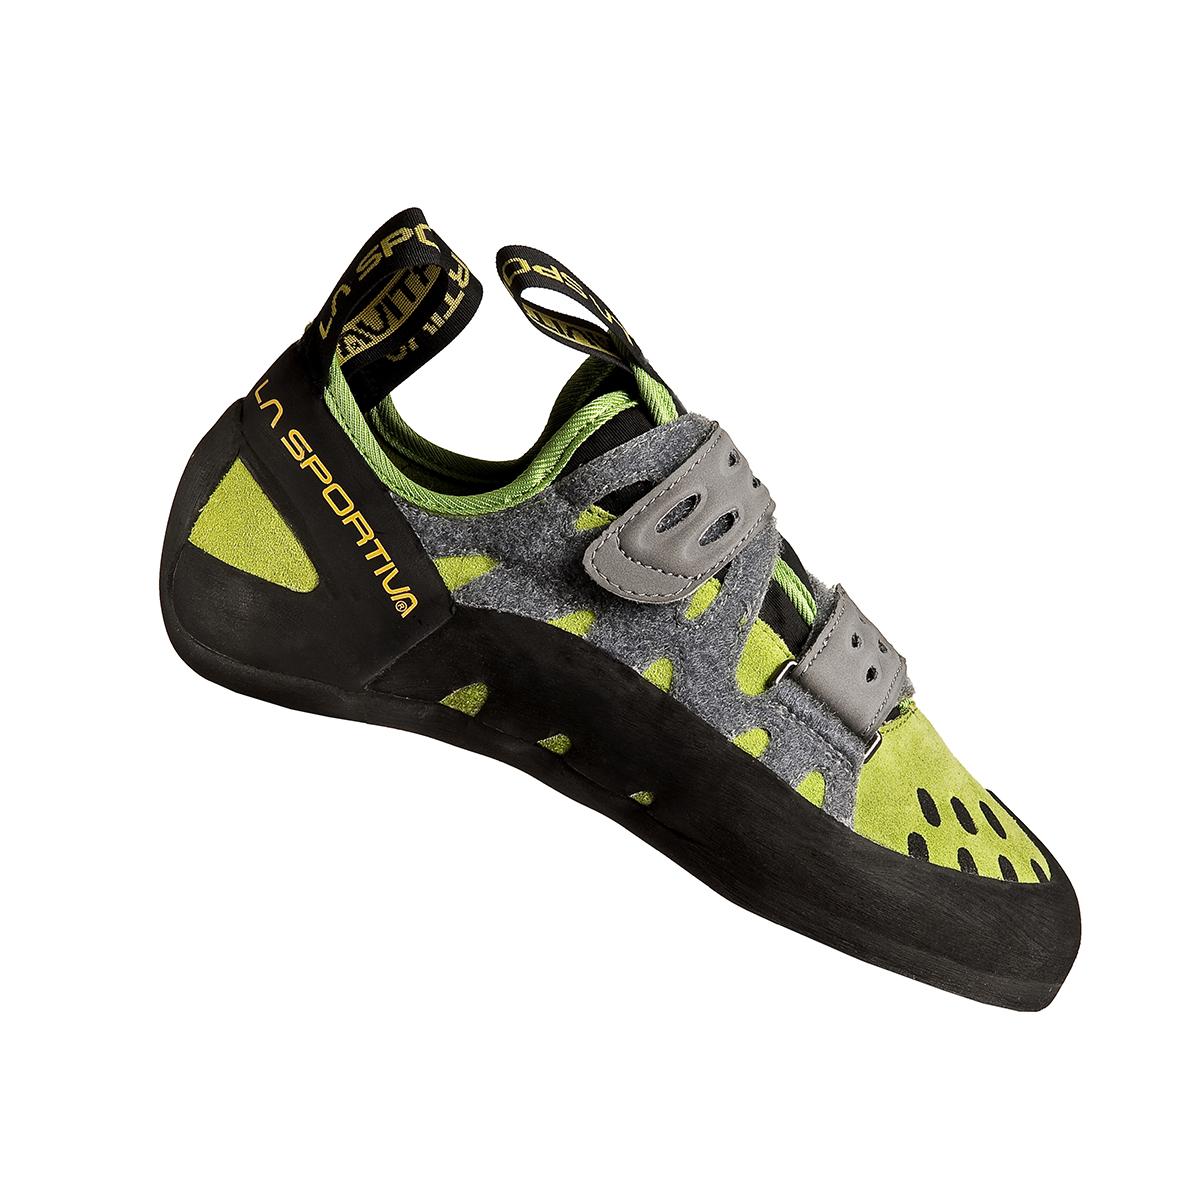 Mens La Sportiva Tarantulace Climbing Shoe Outlet Shop Size 44